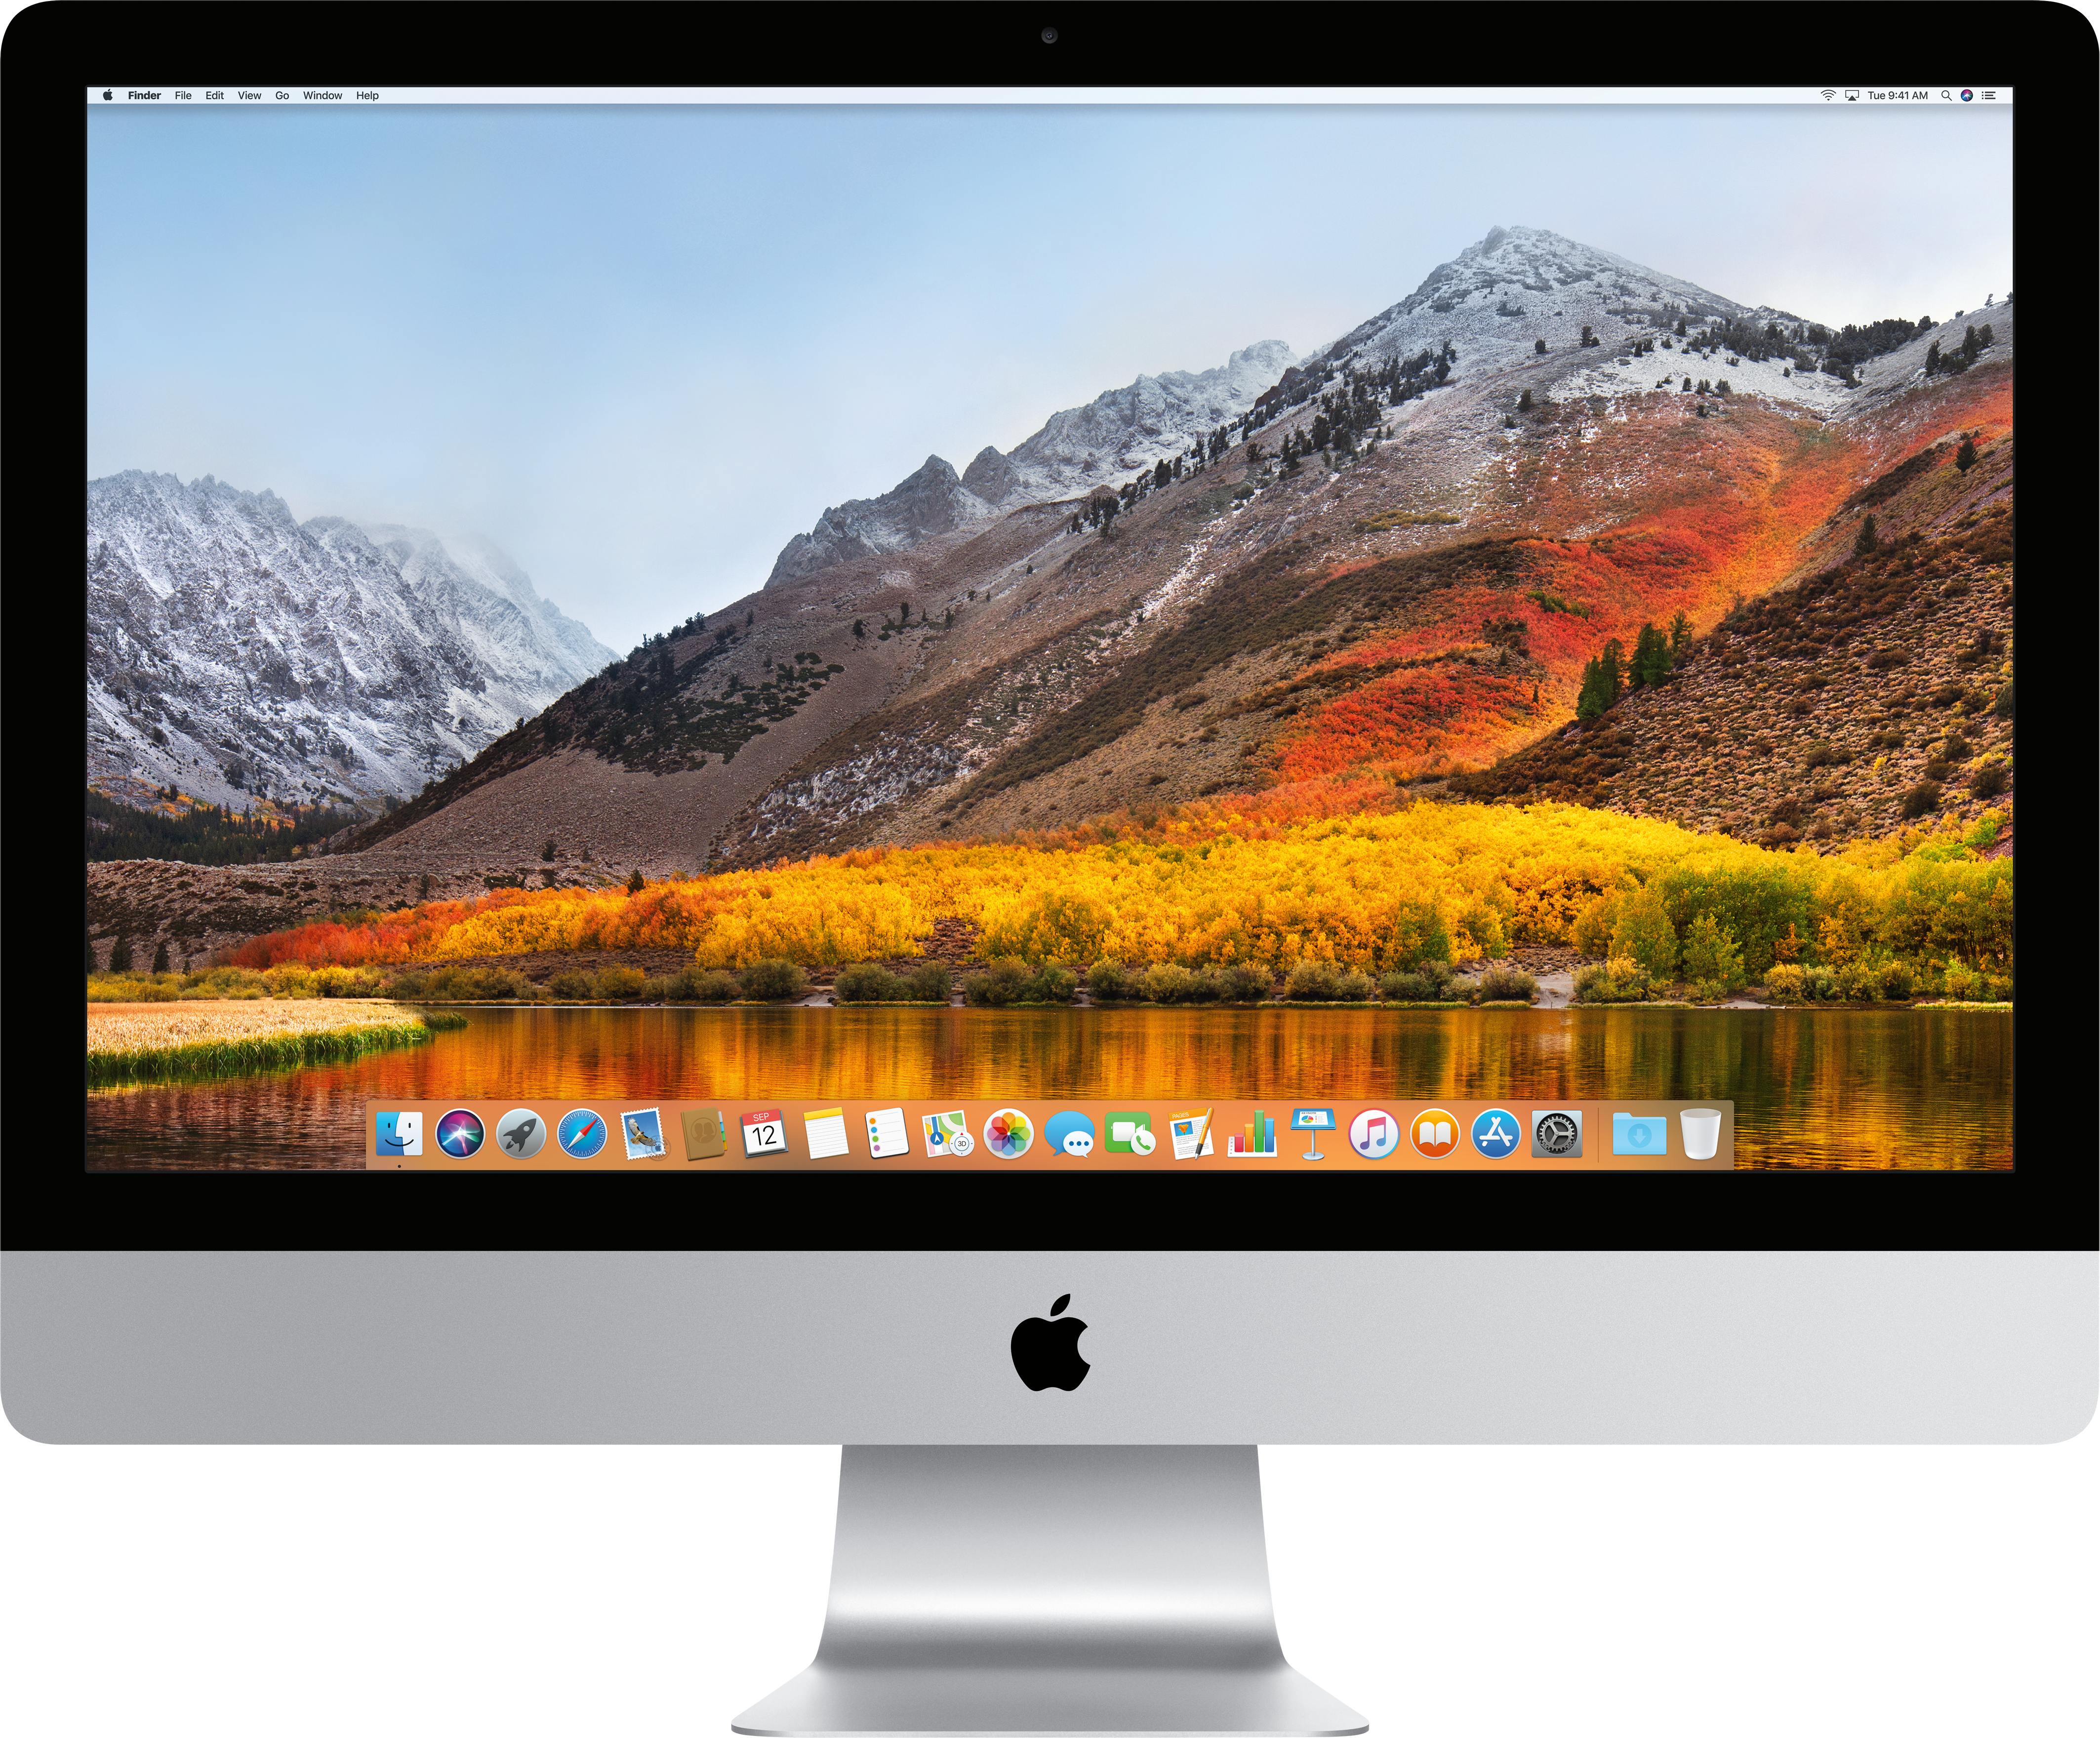 Купить IMac 27 Retina 5K, Intel Core i5, 8 ГБ, 1 ТБ Fusion Drive, AMD Radeon Pro 575, APPLE